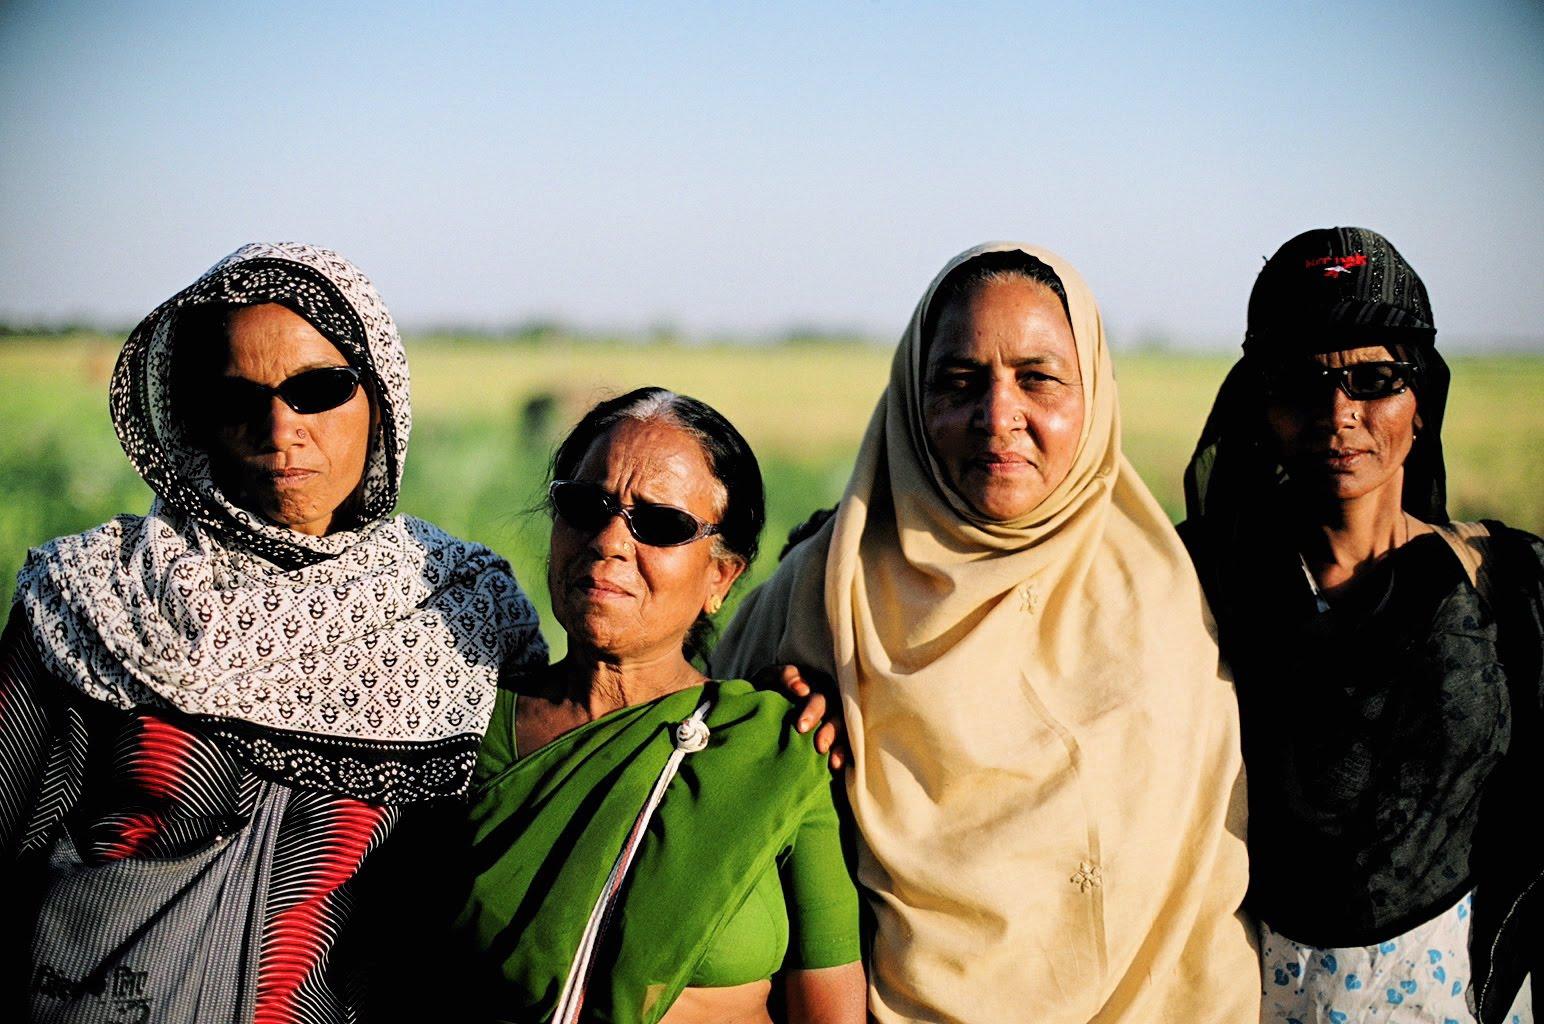 arthur+martha: We are flames not flowers: Bhopal survivors film